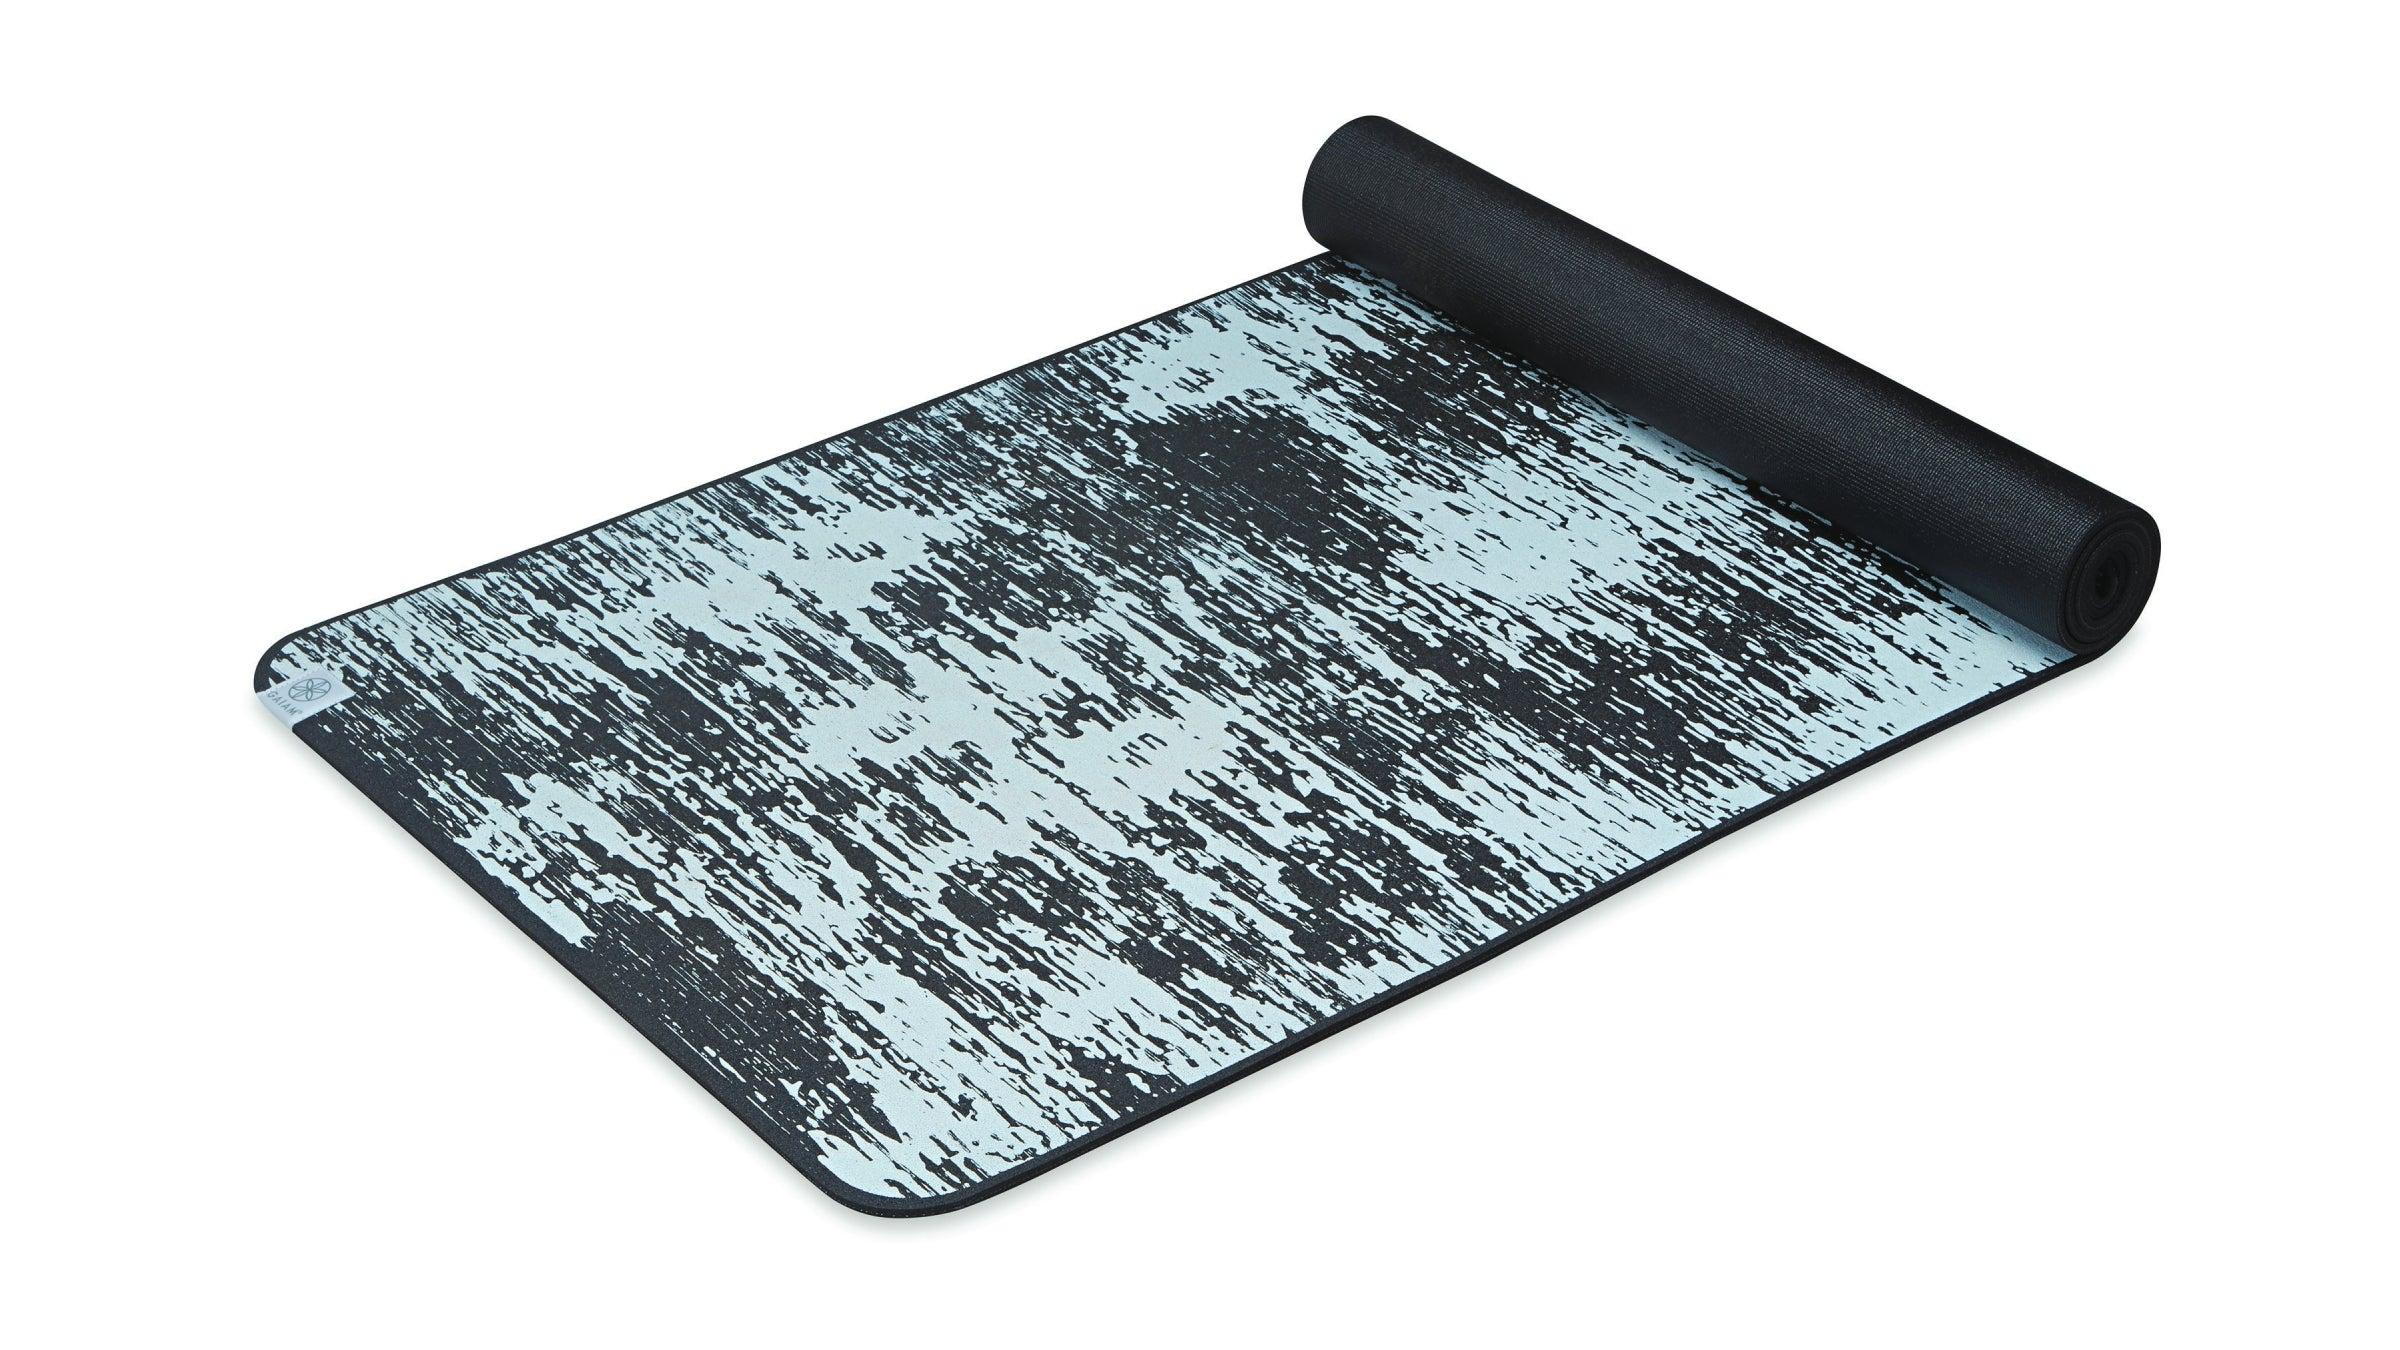 Black and gray yoga mat